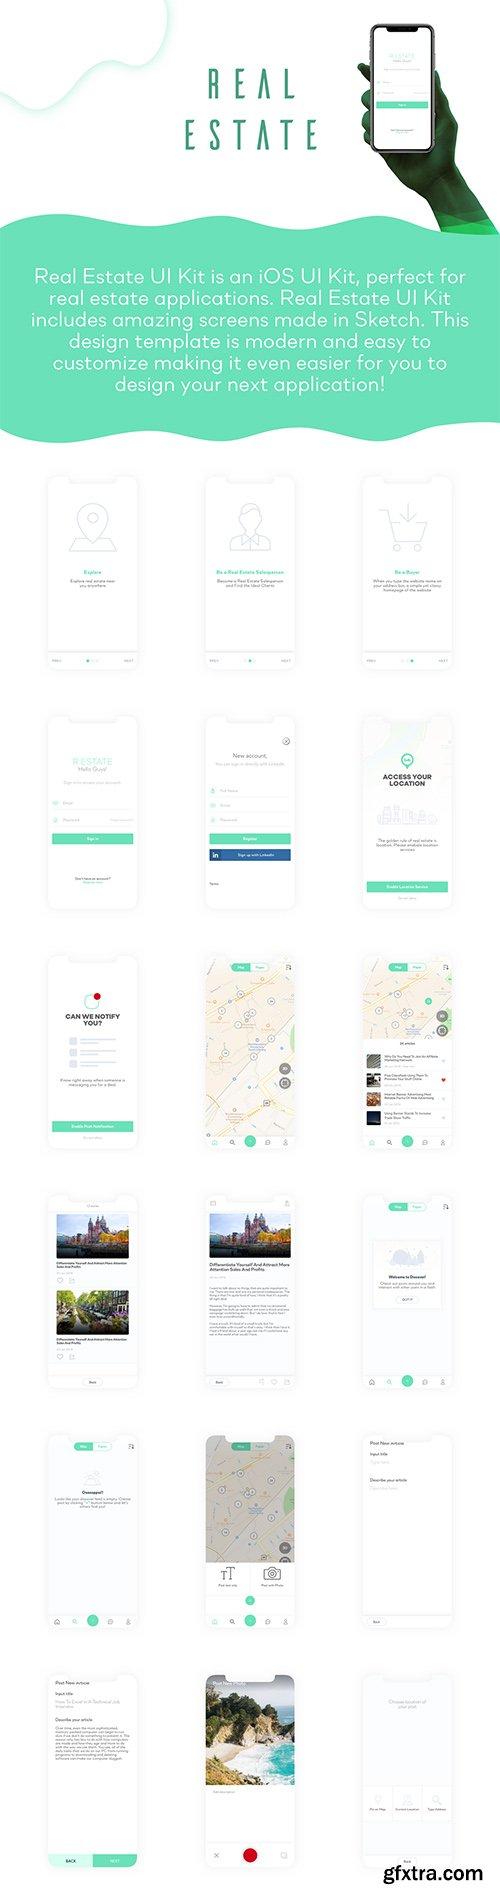 Real Estate iOS UI Kit